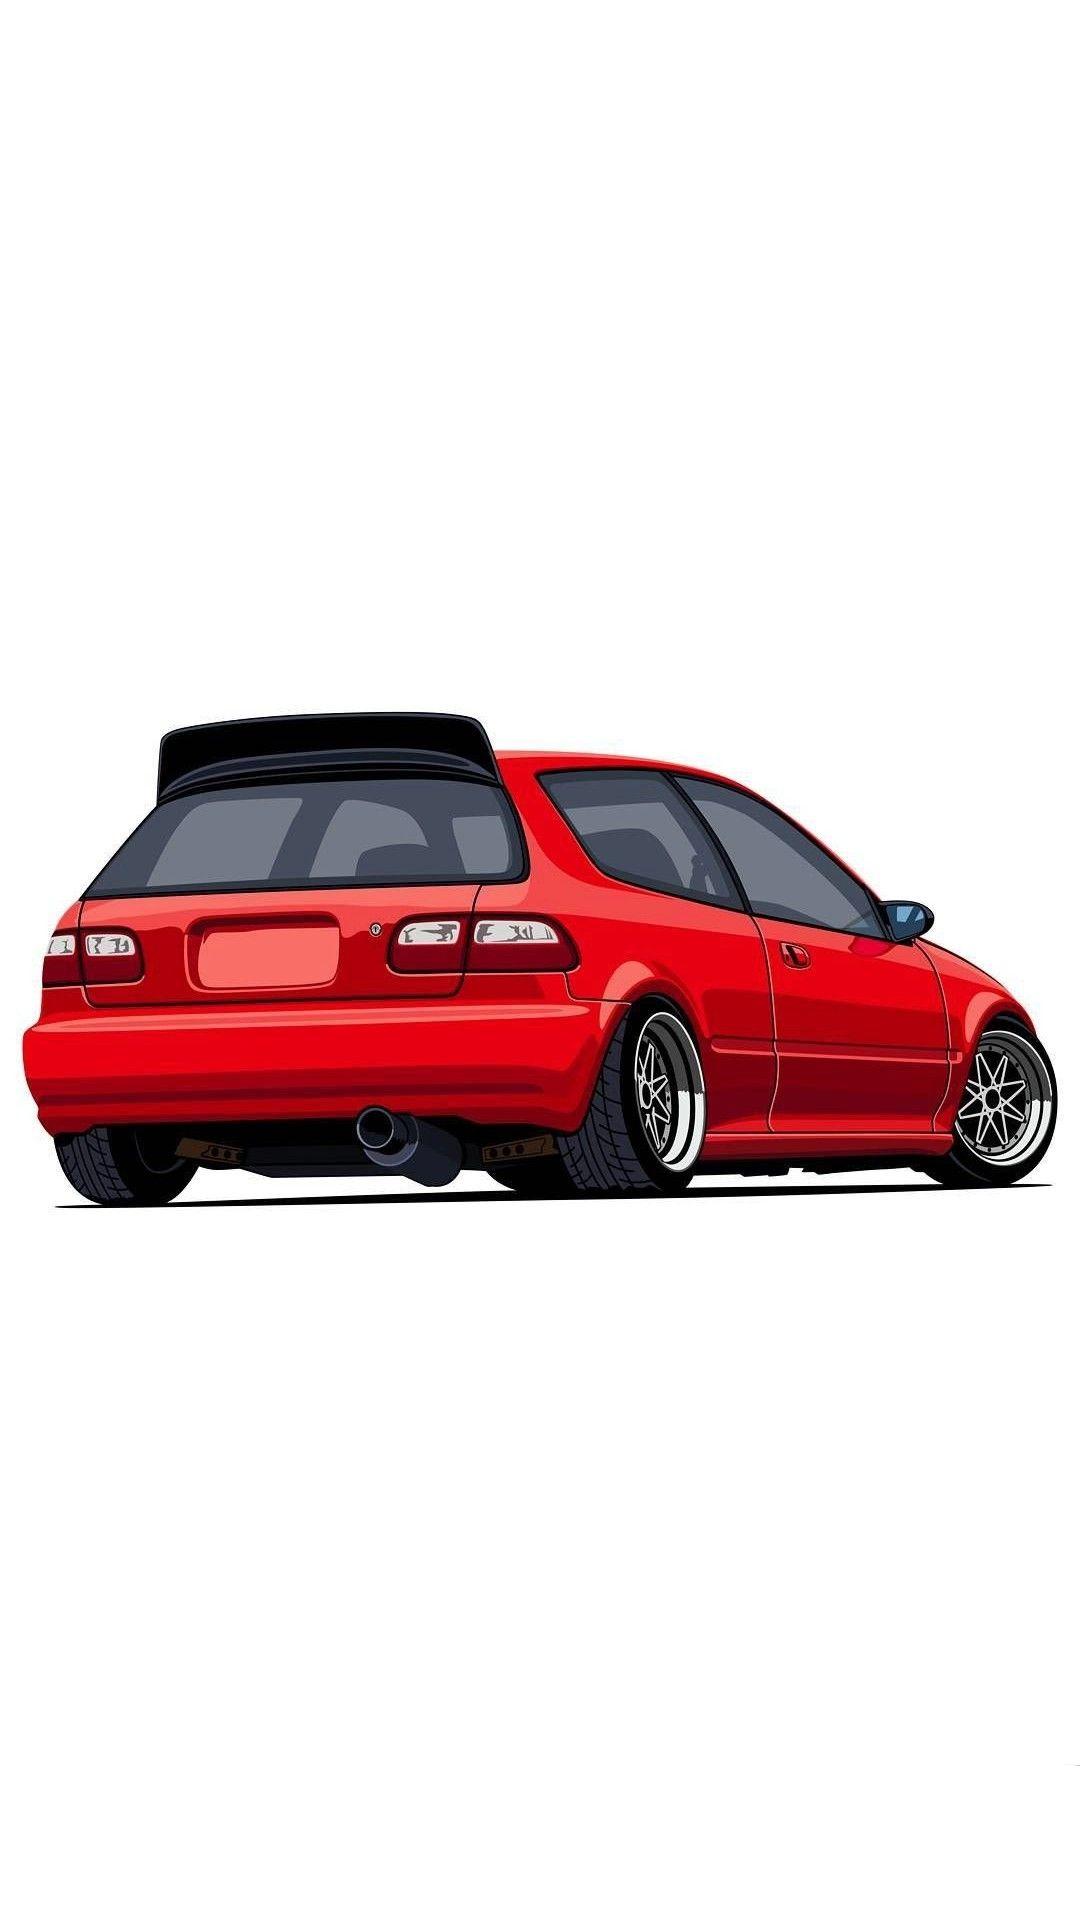 Estillo Car wallpapers Japan cars Civic hatchback 1080x1920